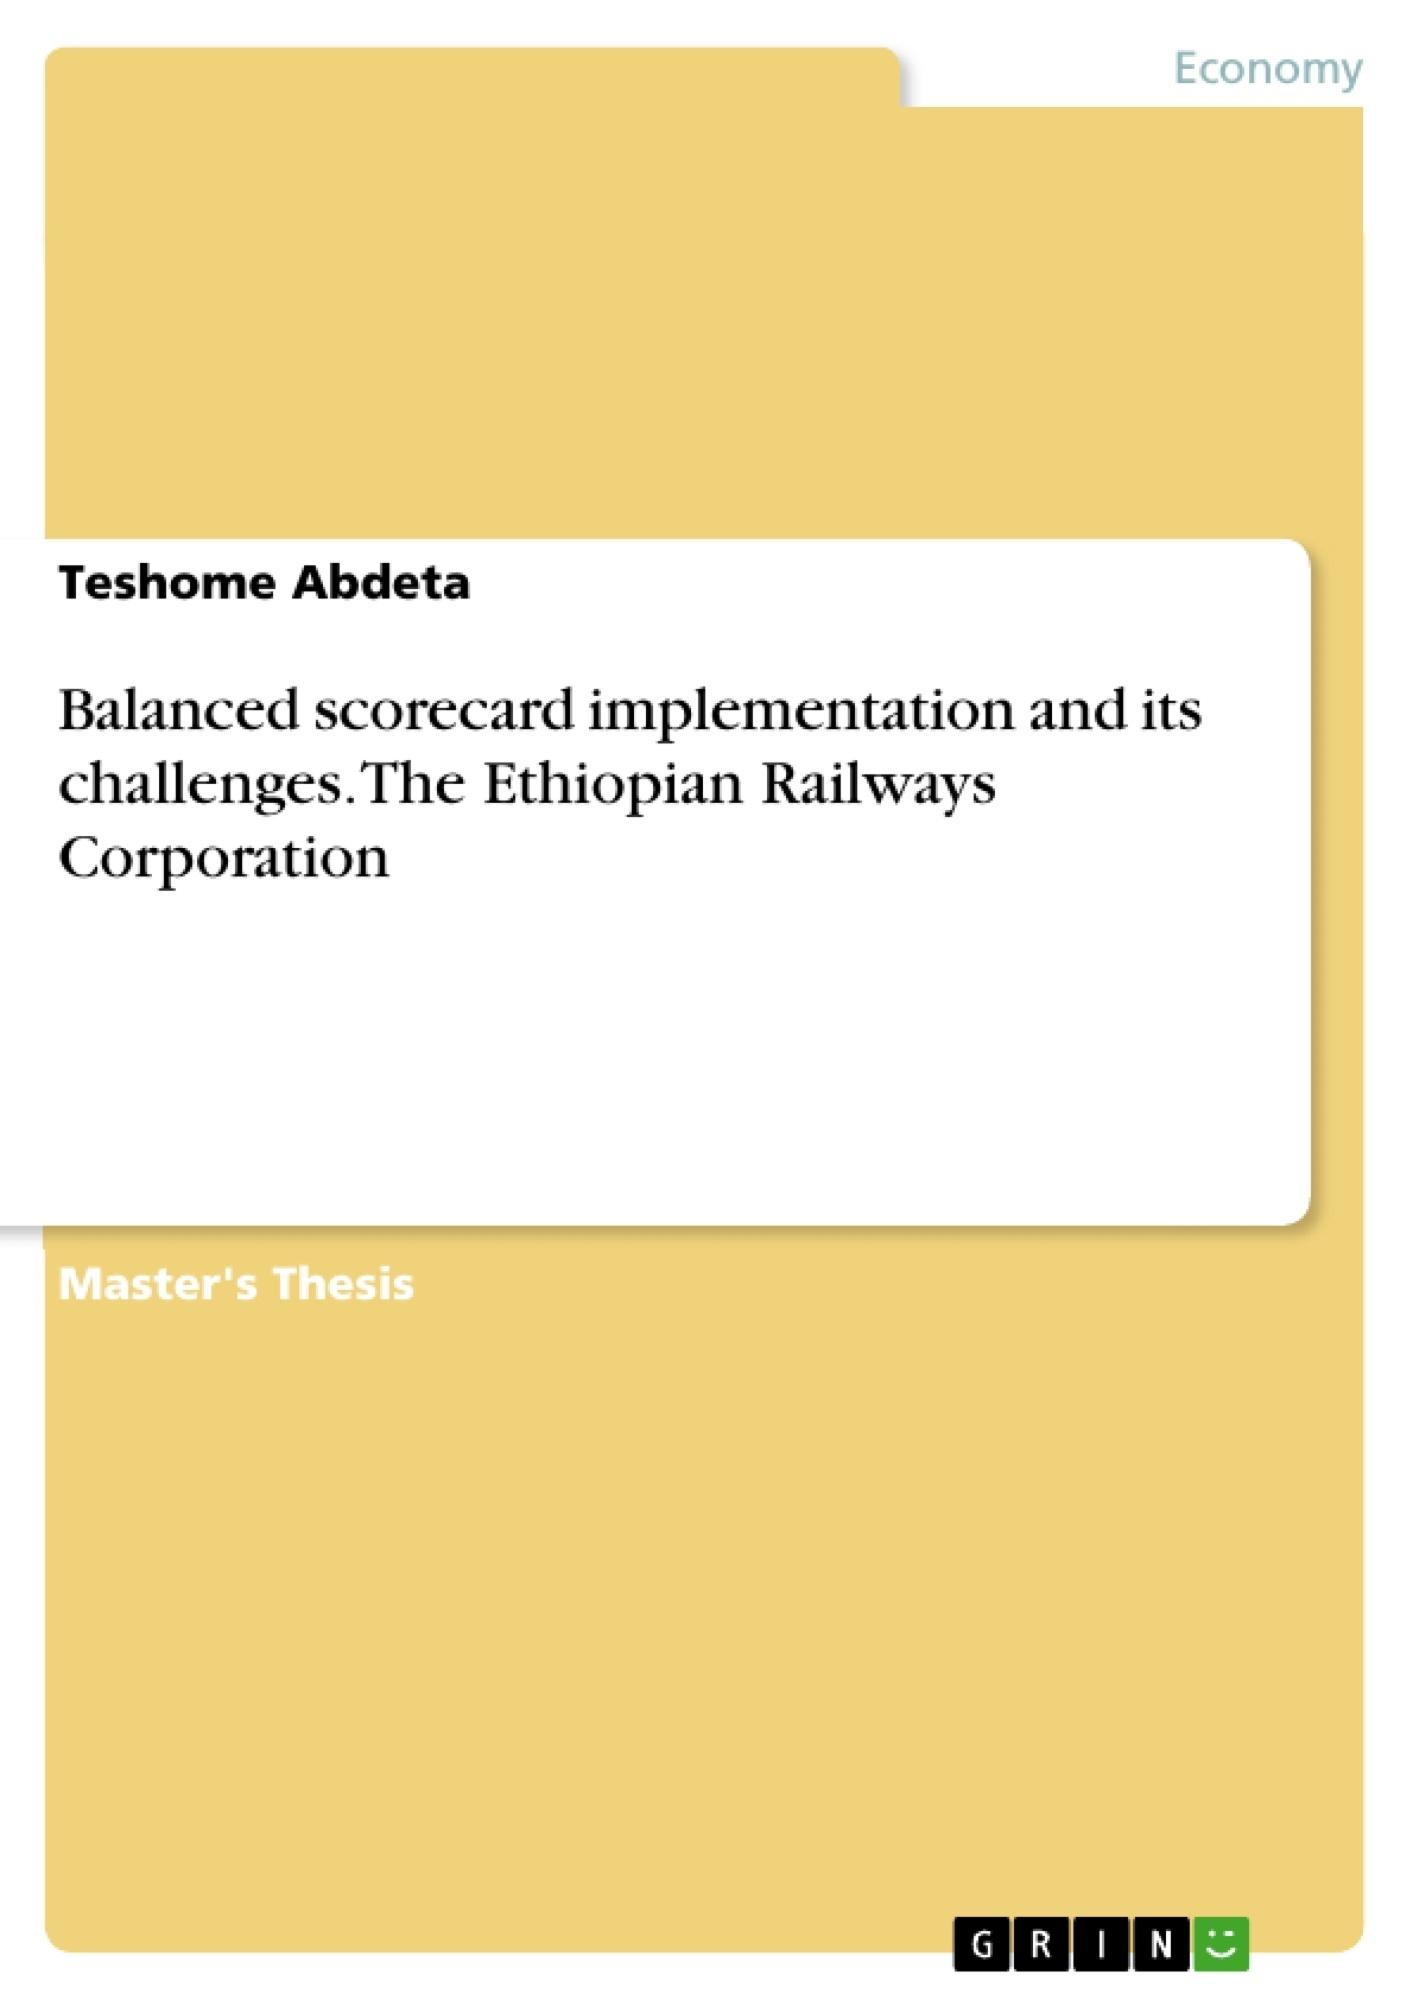 Title: Balanced scorecard implementation and its challenges. The Ethiopian Railways Corporation